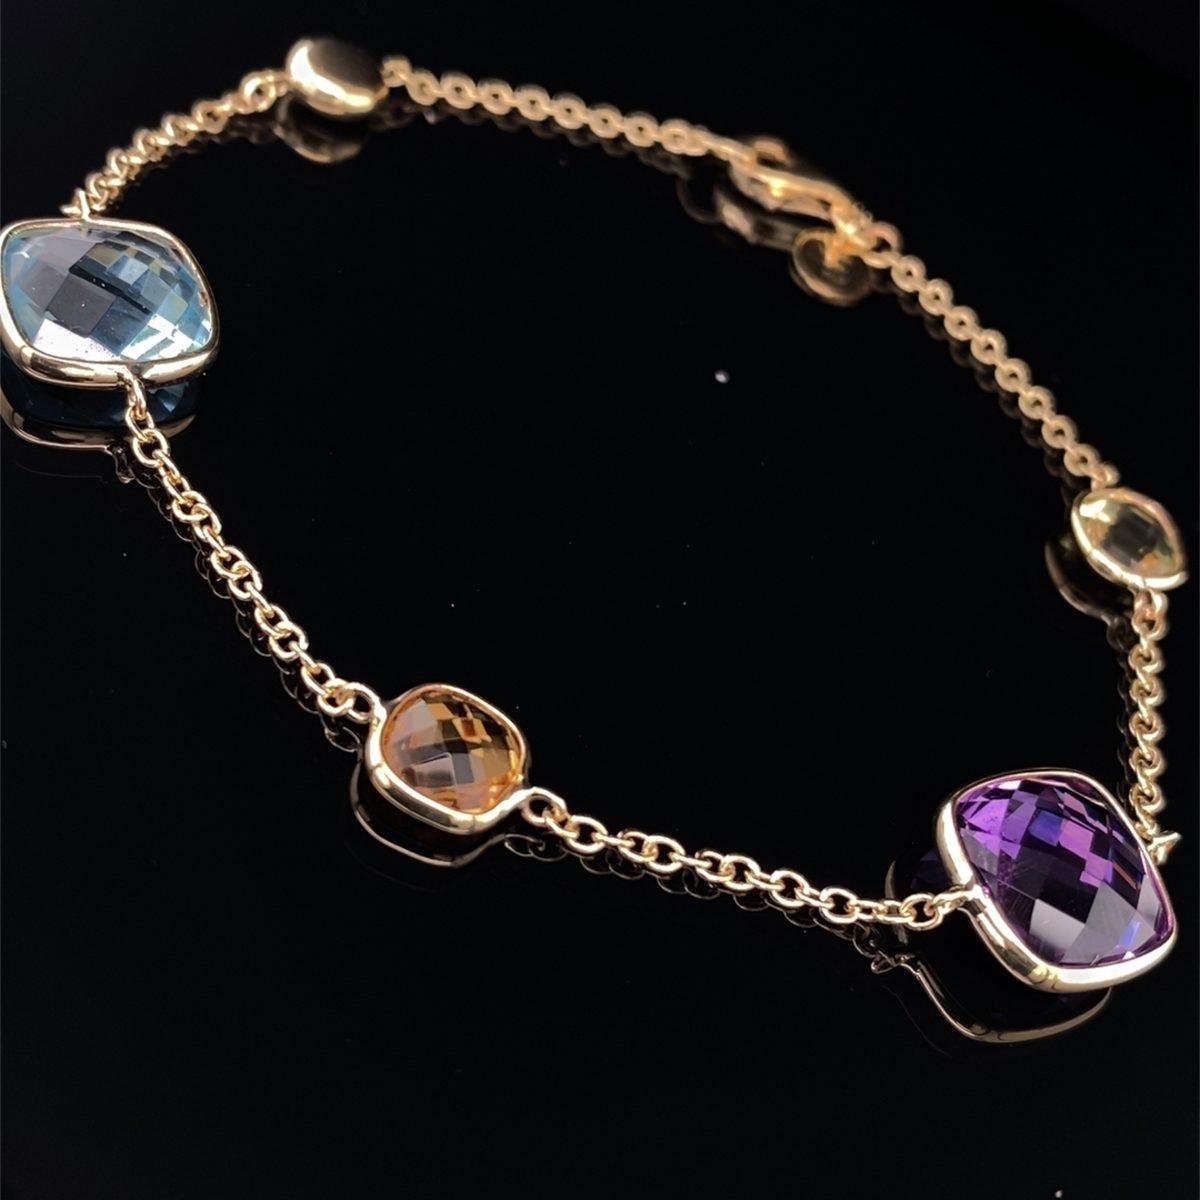 Lemon quartz, amethyst and blue topaz bracelet